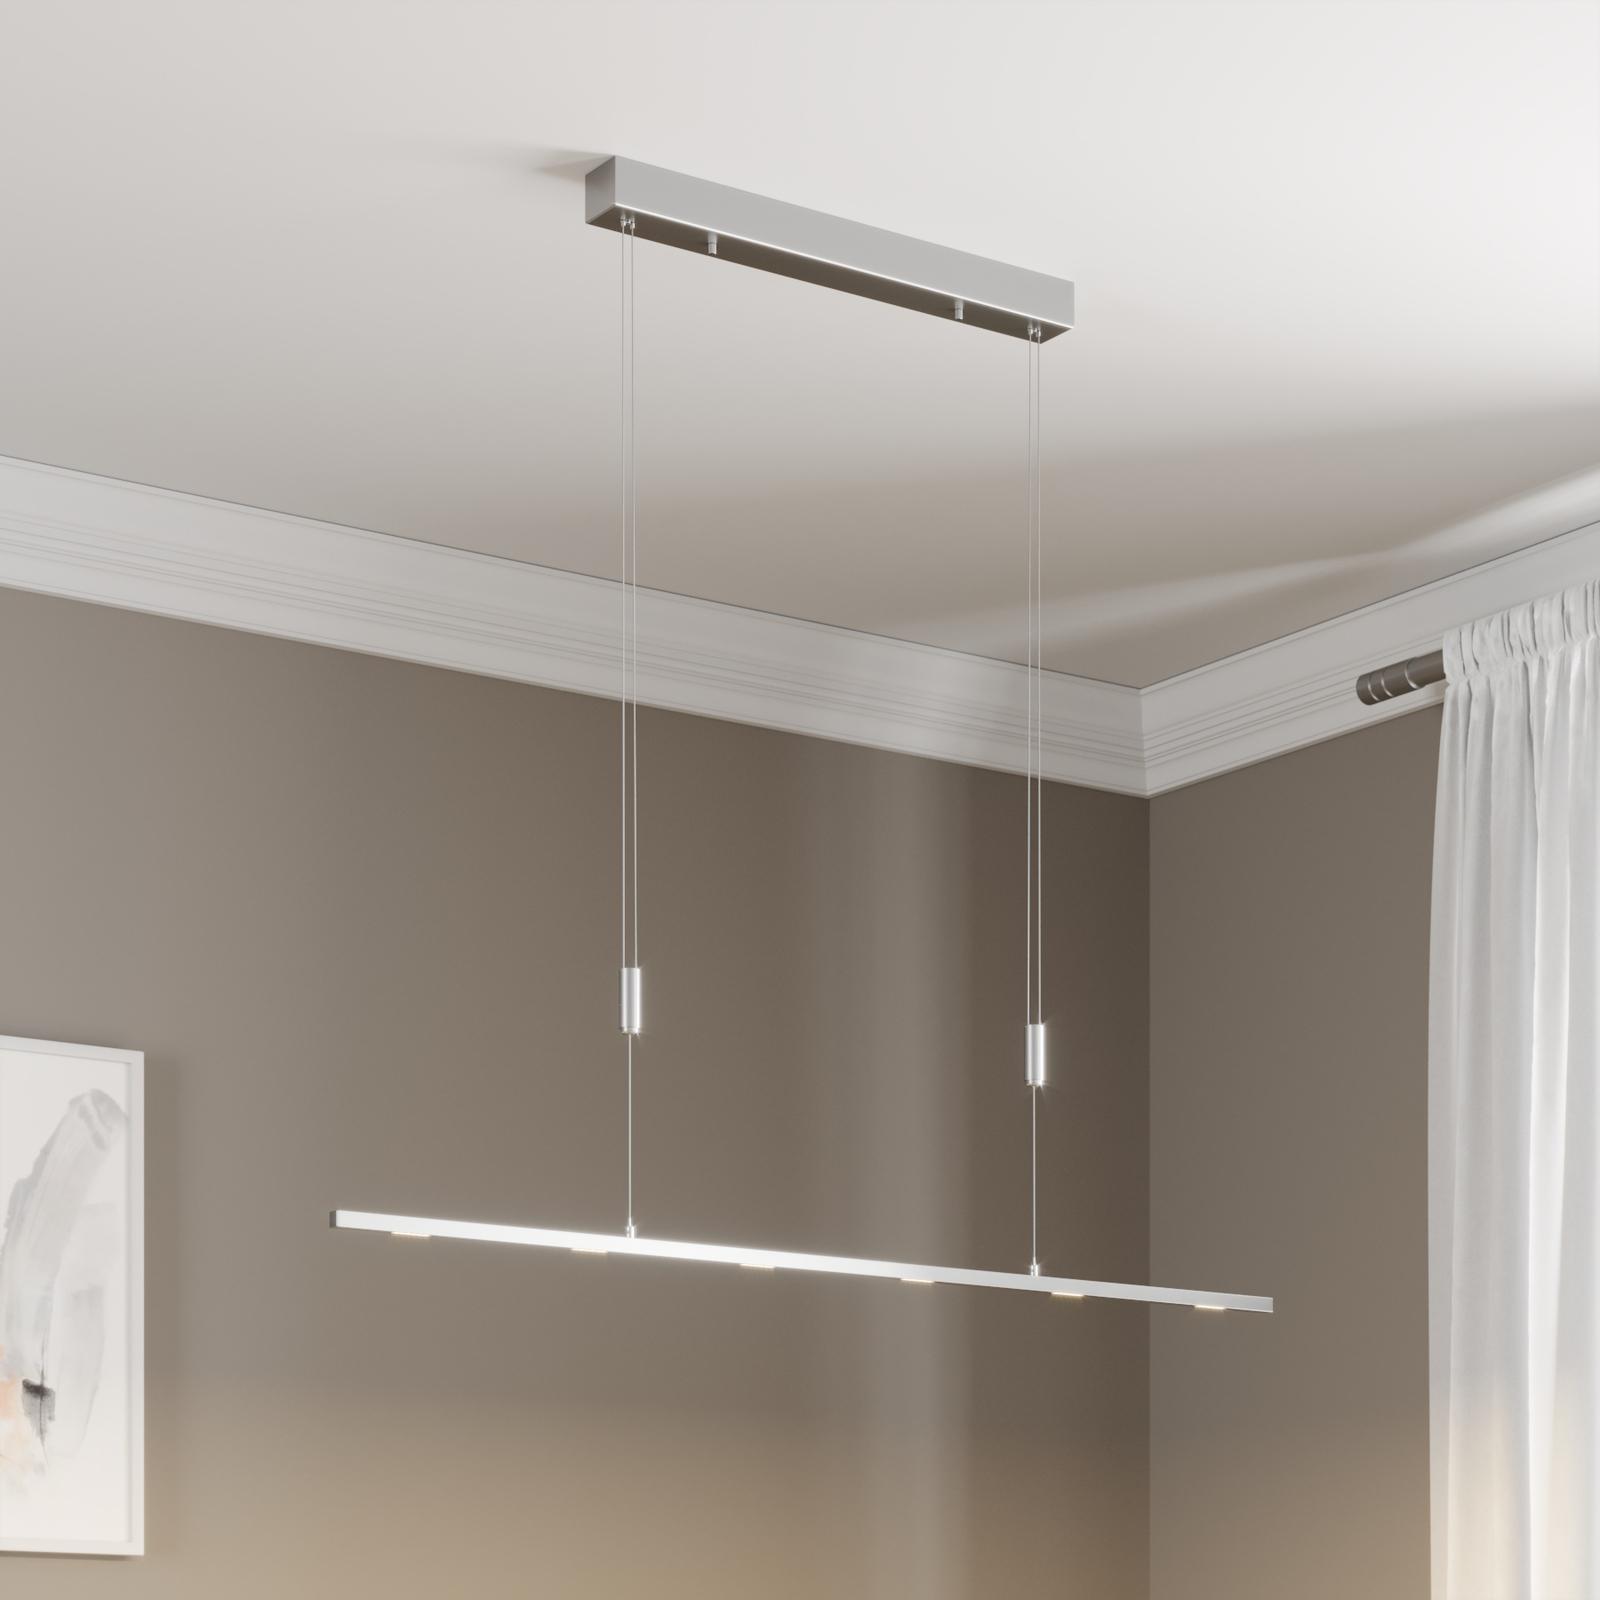 LED-Esszimmer-Pendellampe Arnik, dimmbar, 120 cm